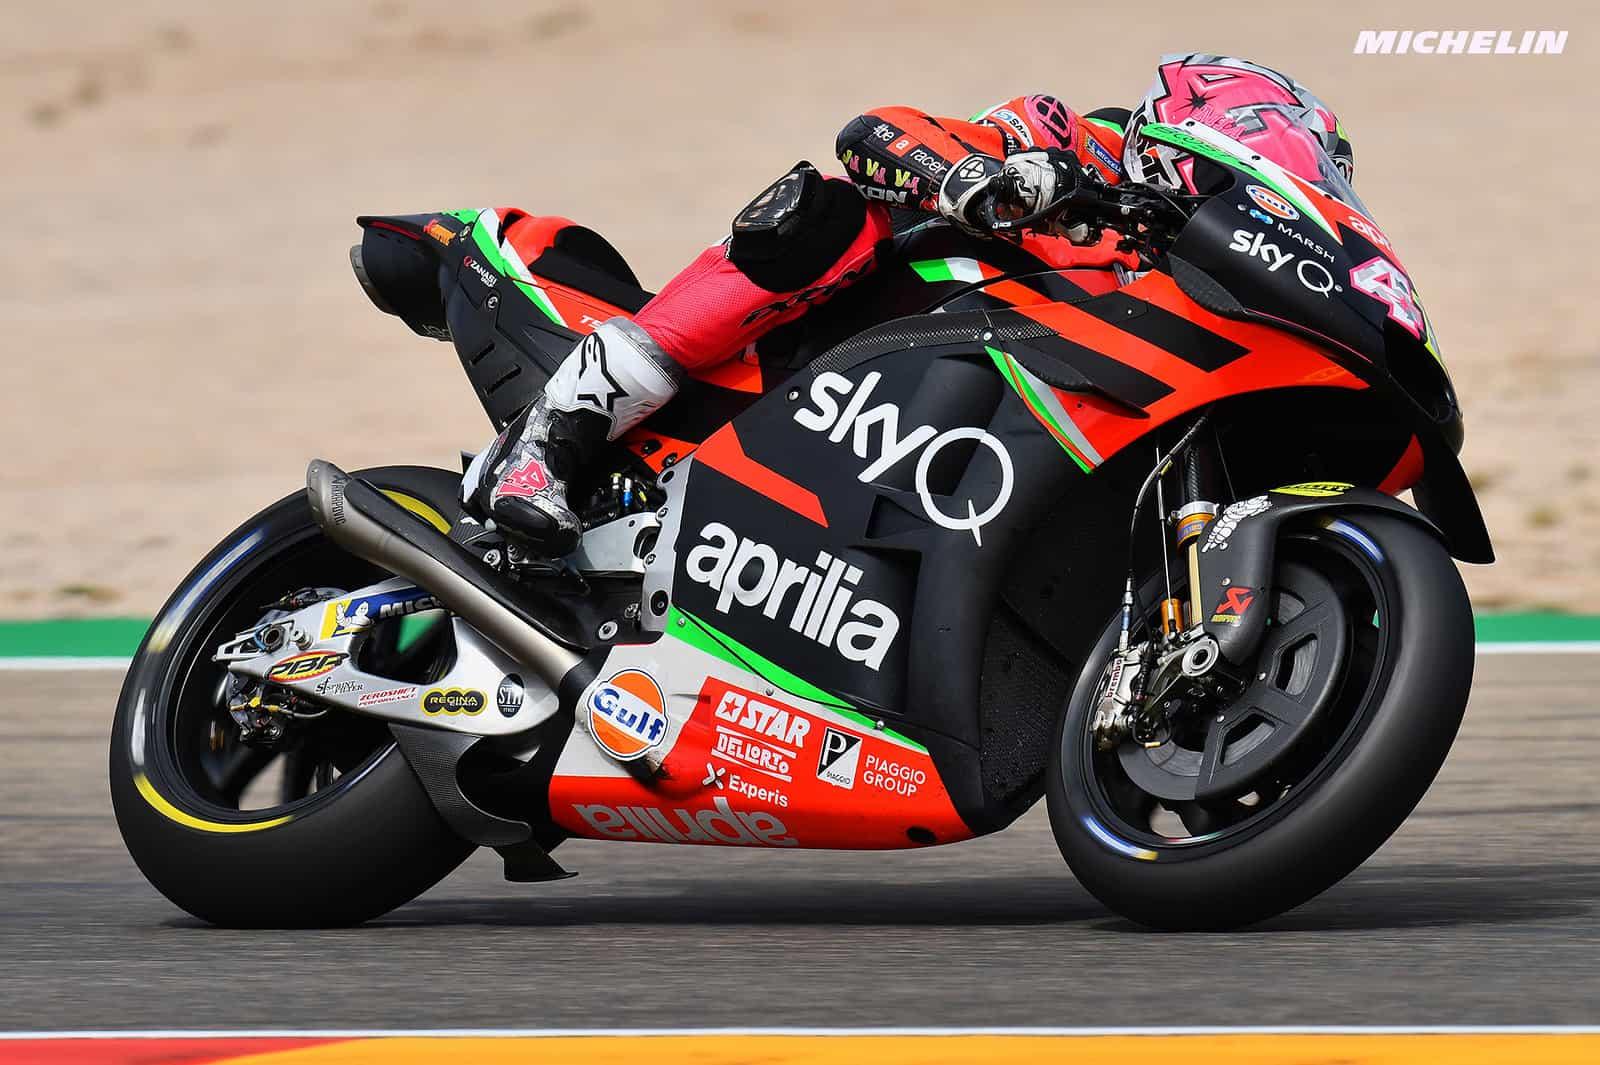 MotoGP2019アラゴンGP 7位アレイシ・エスパルガロ「今回はトラックの性格に助けられた」